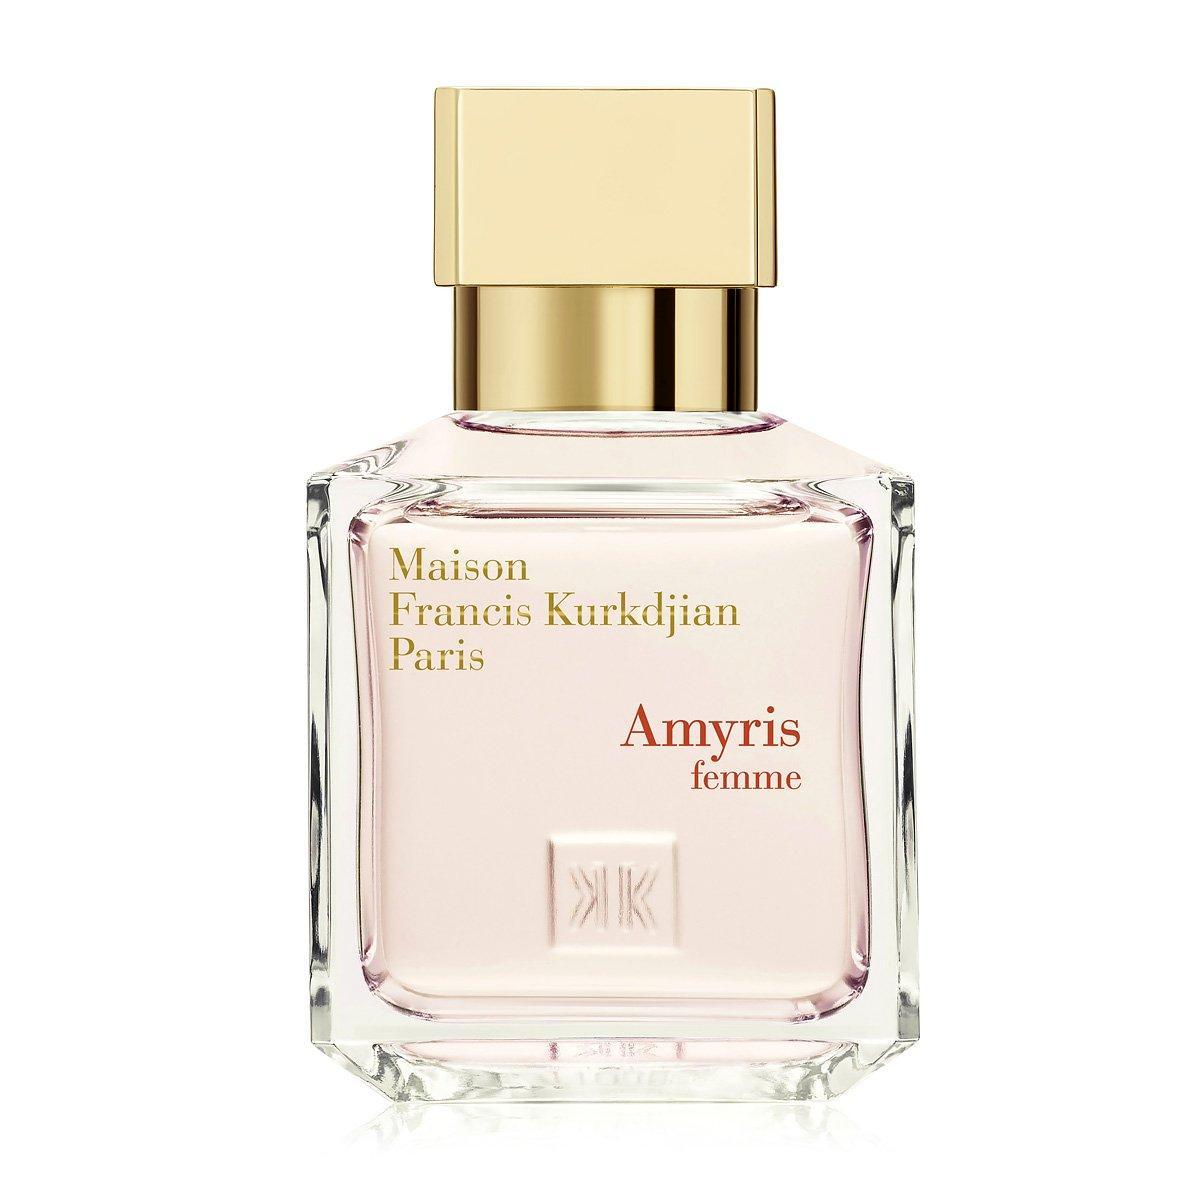 Maison Francis Kurkdjian Amyris Femme 6ml